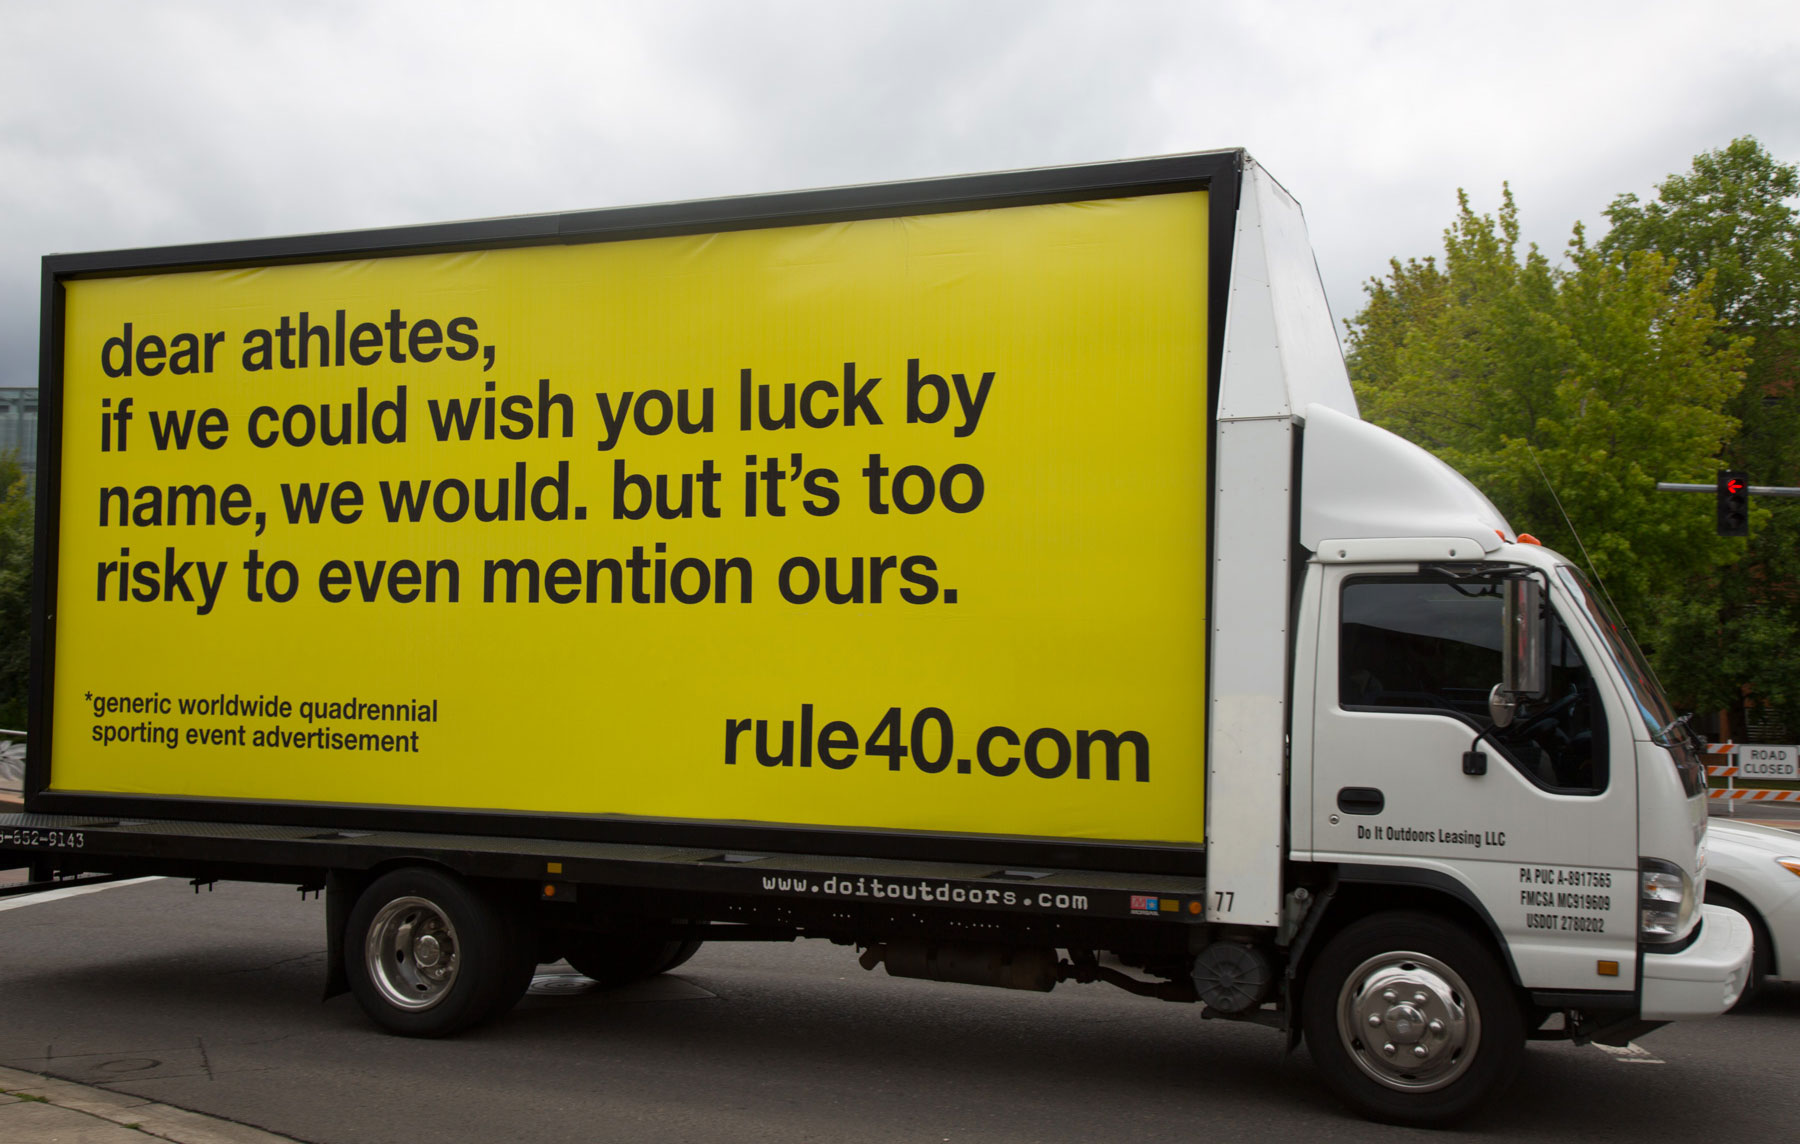 http://rule40.com/